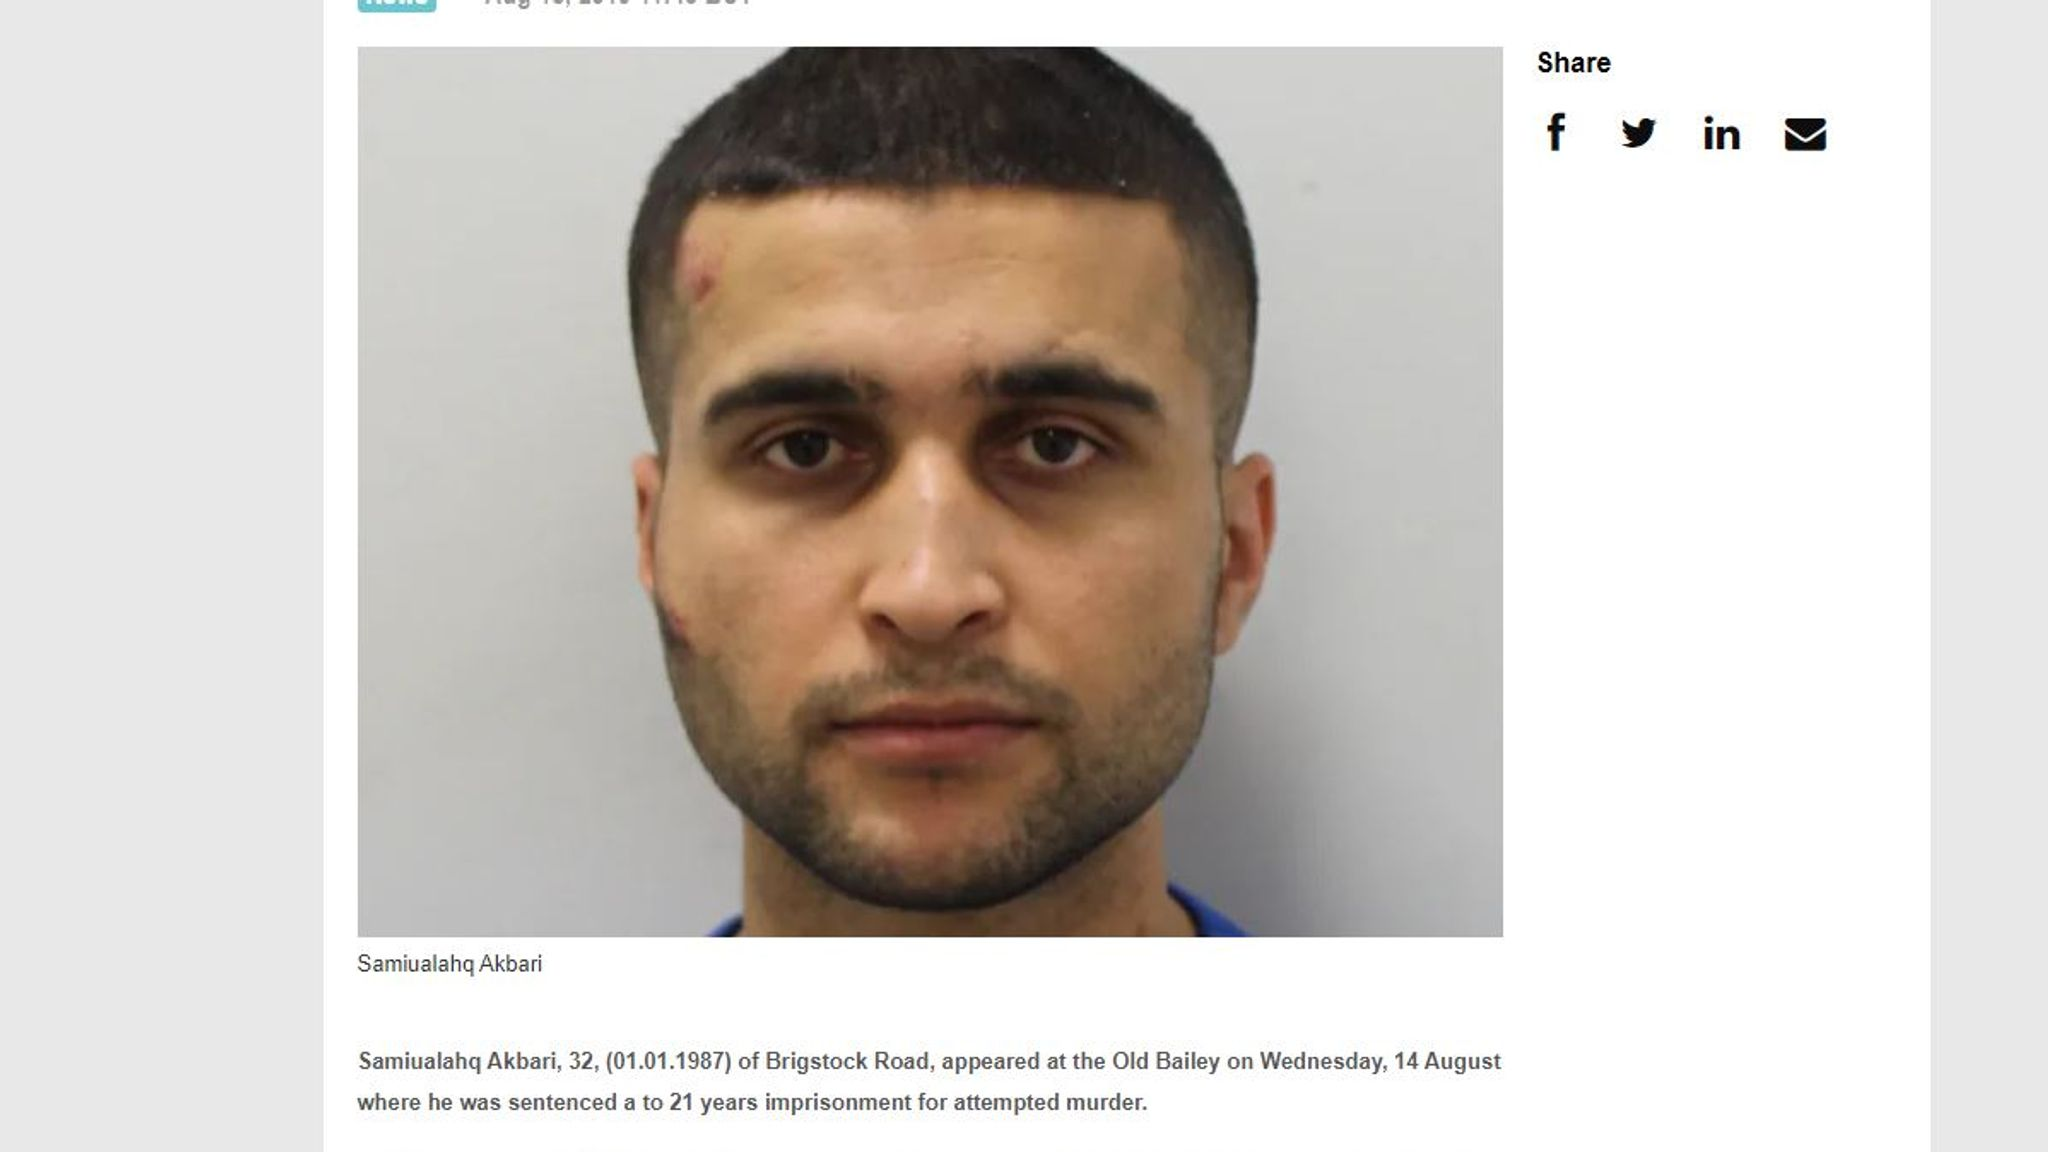 Samiualahq Akbari: Knifeman jailed for 21 years over 'kill English people' rampage